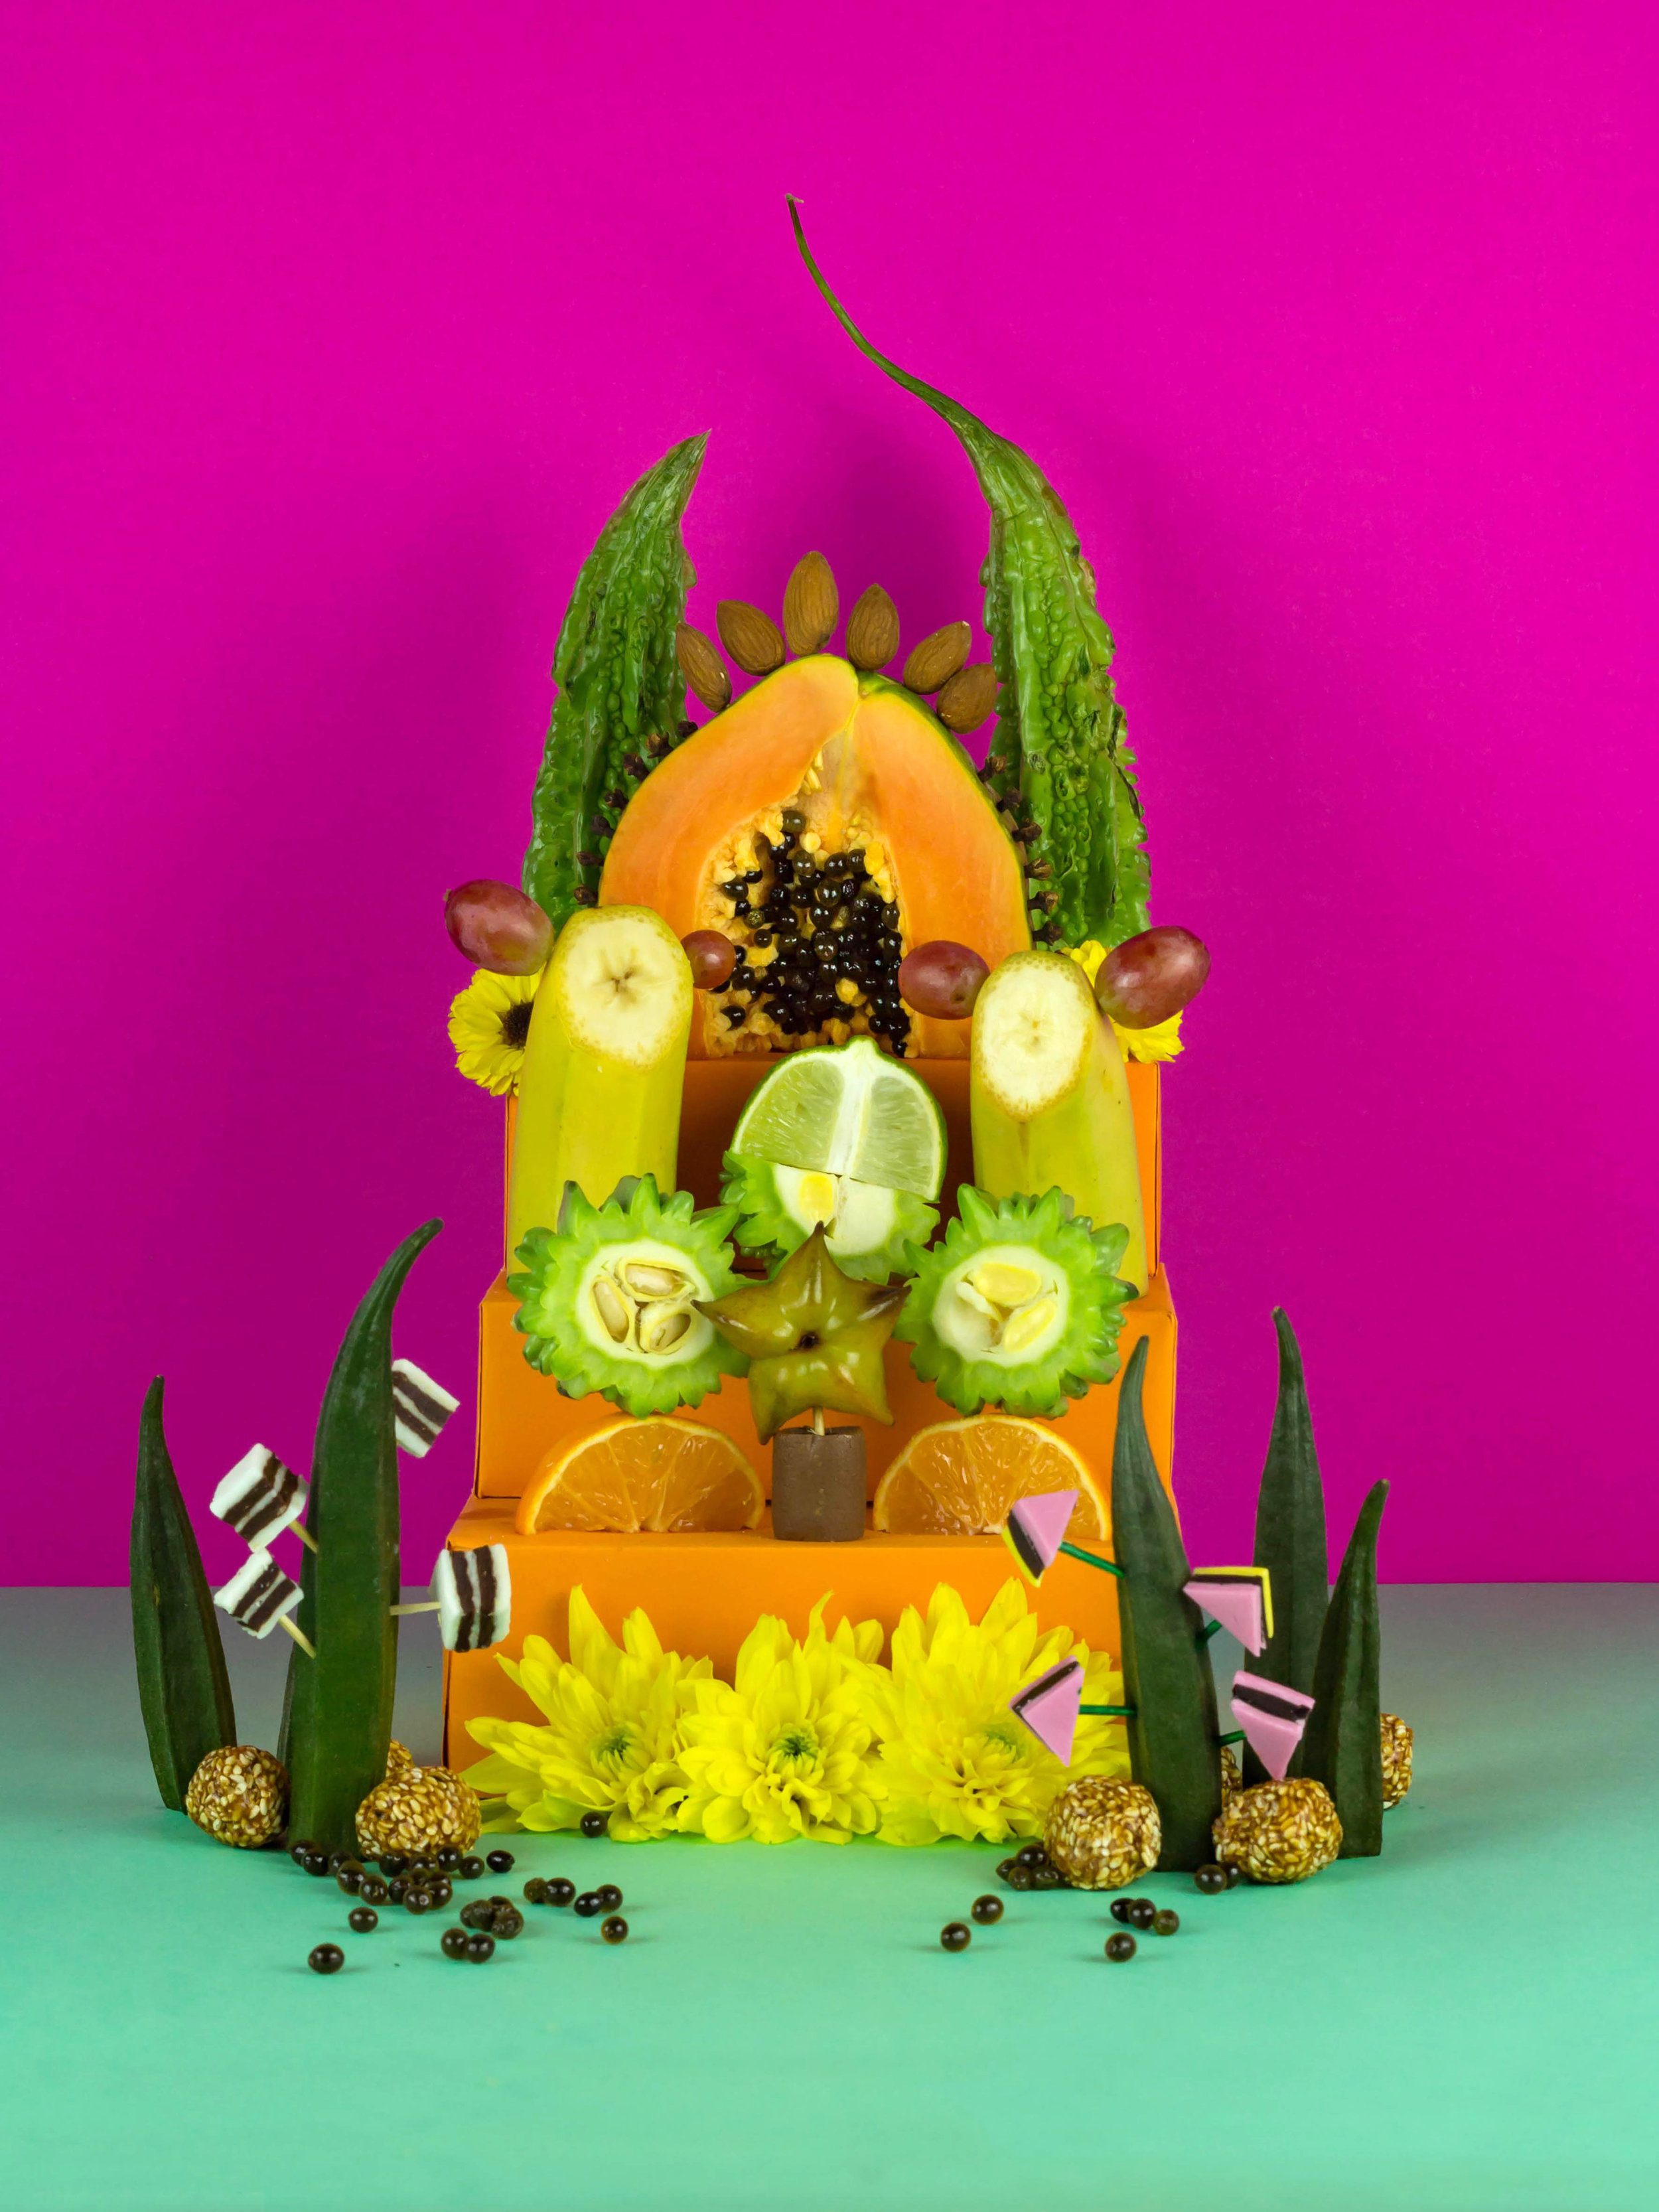 PedestaledMemory_Fruits_RGB.jpg